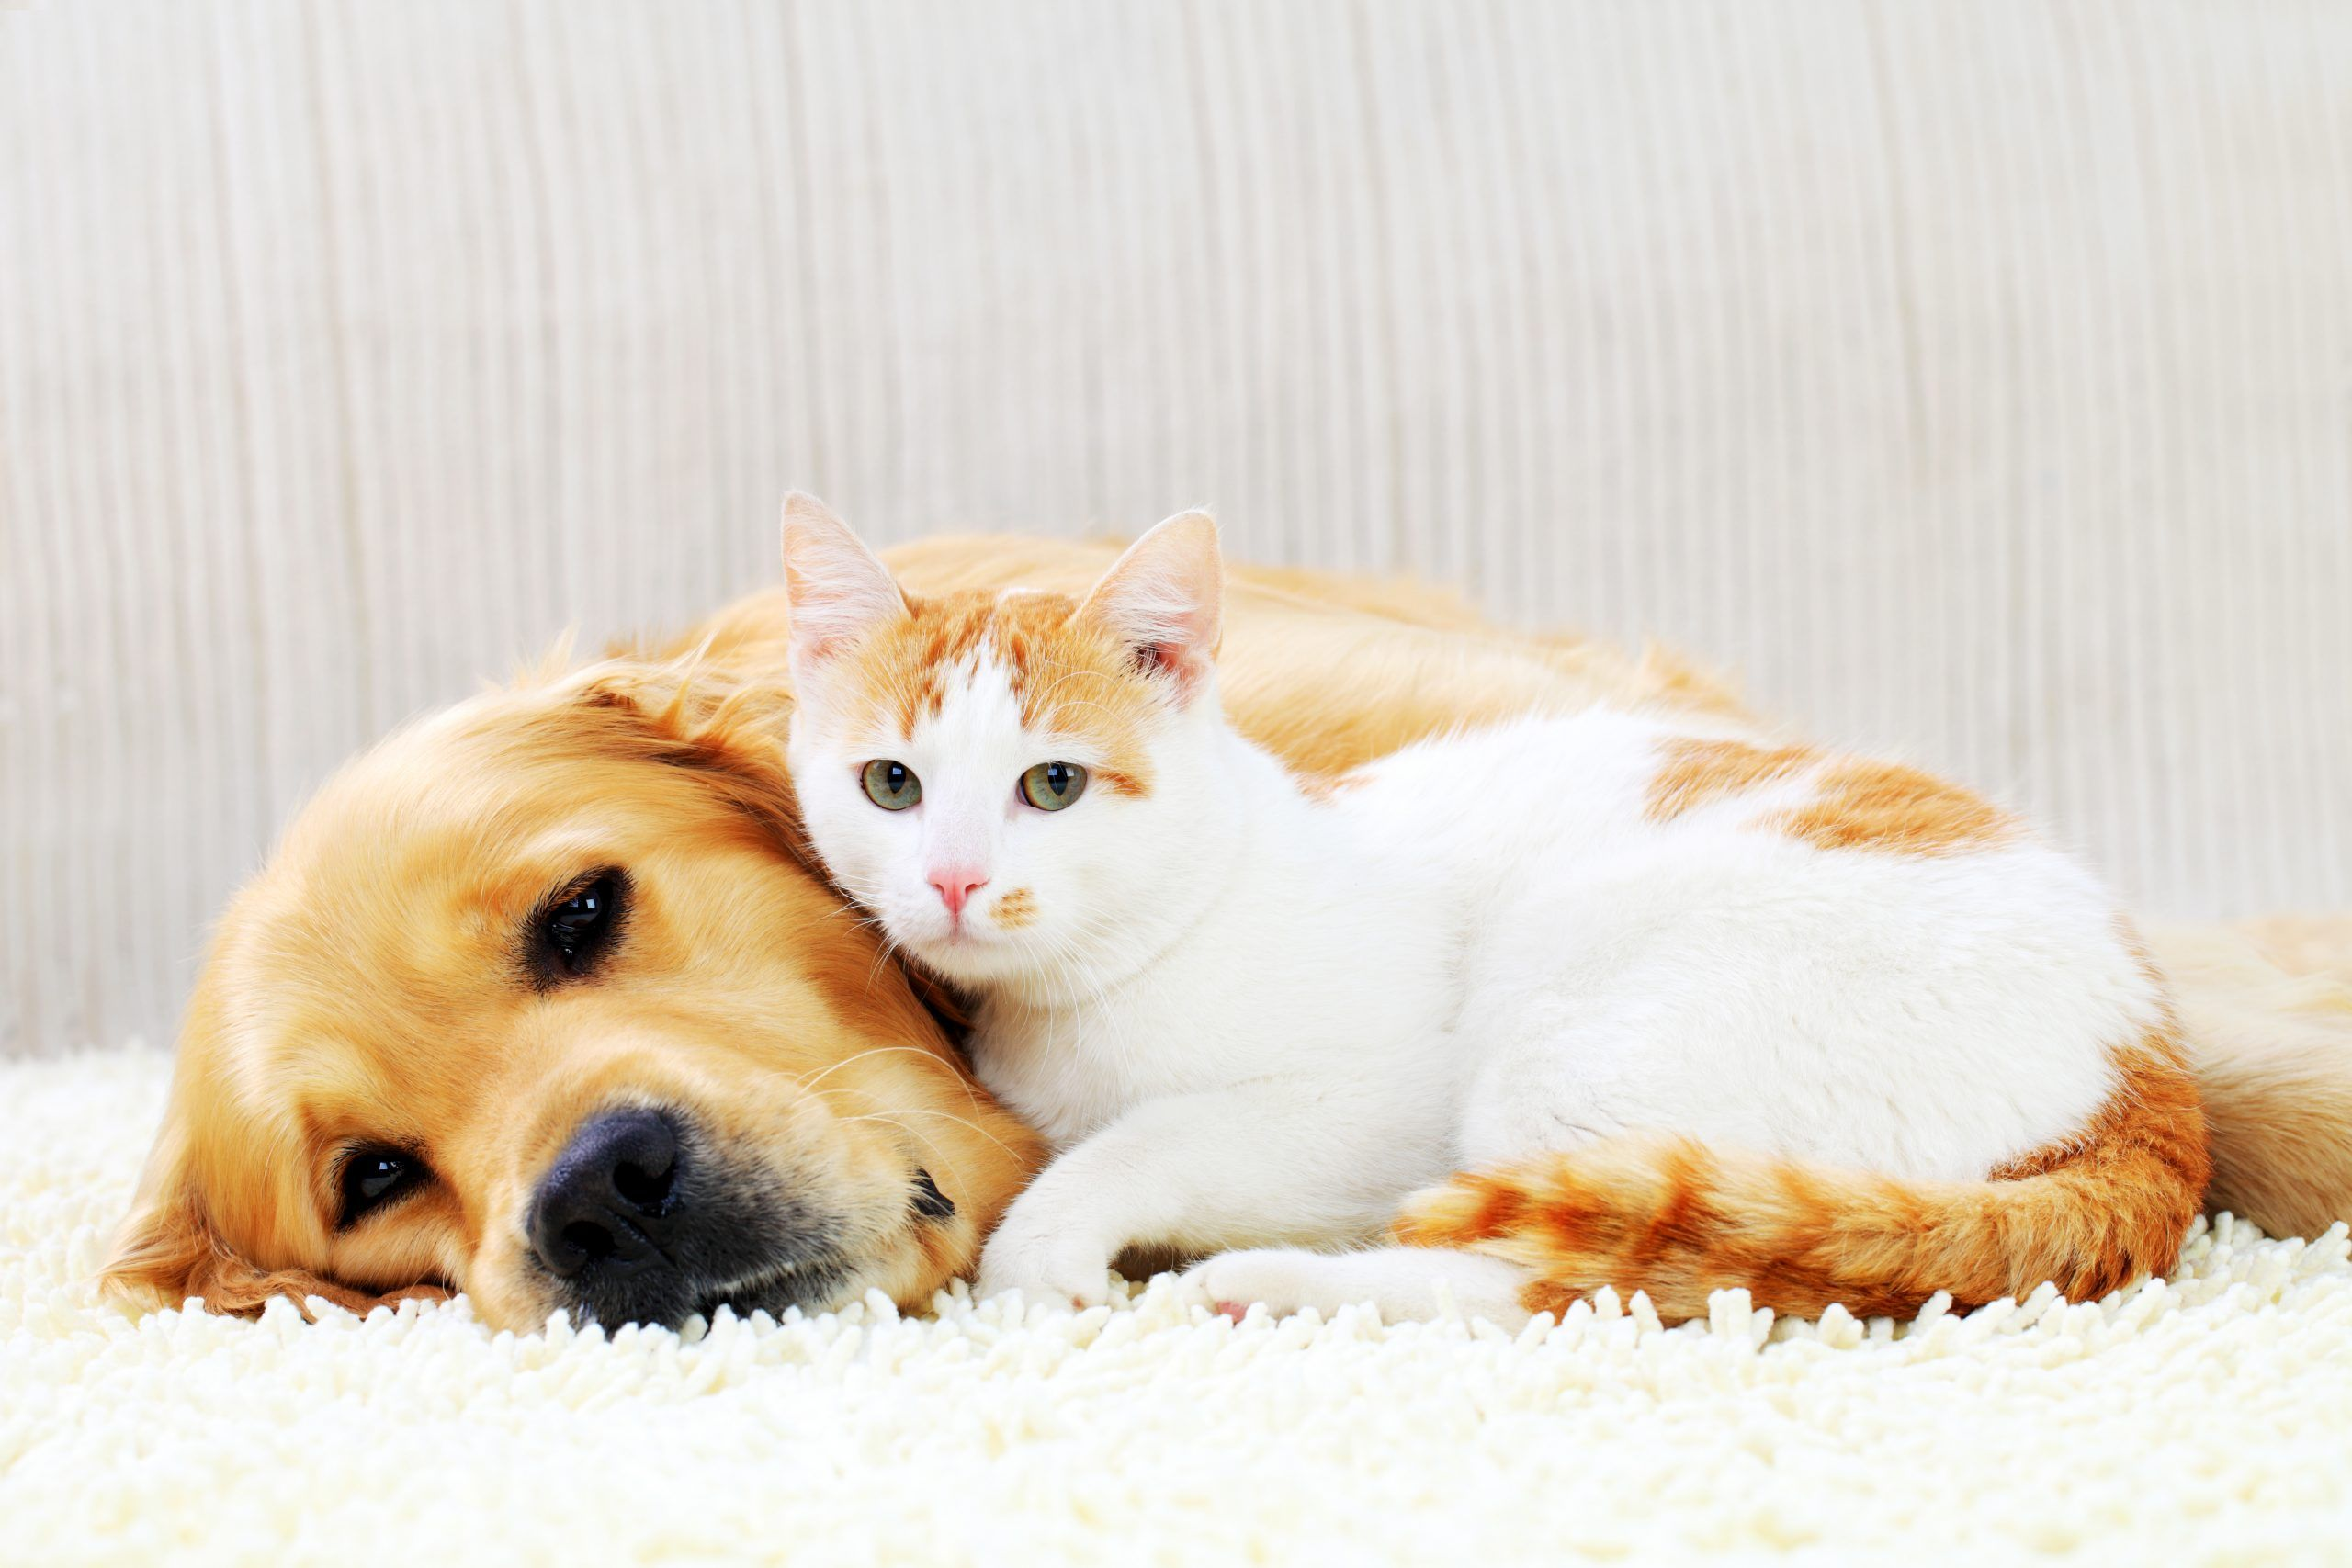 Hond en drie katten besmet met coronavirus in Nederland